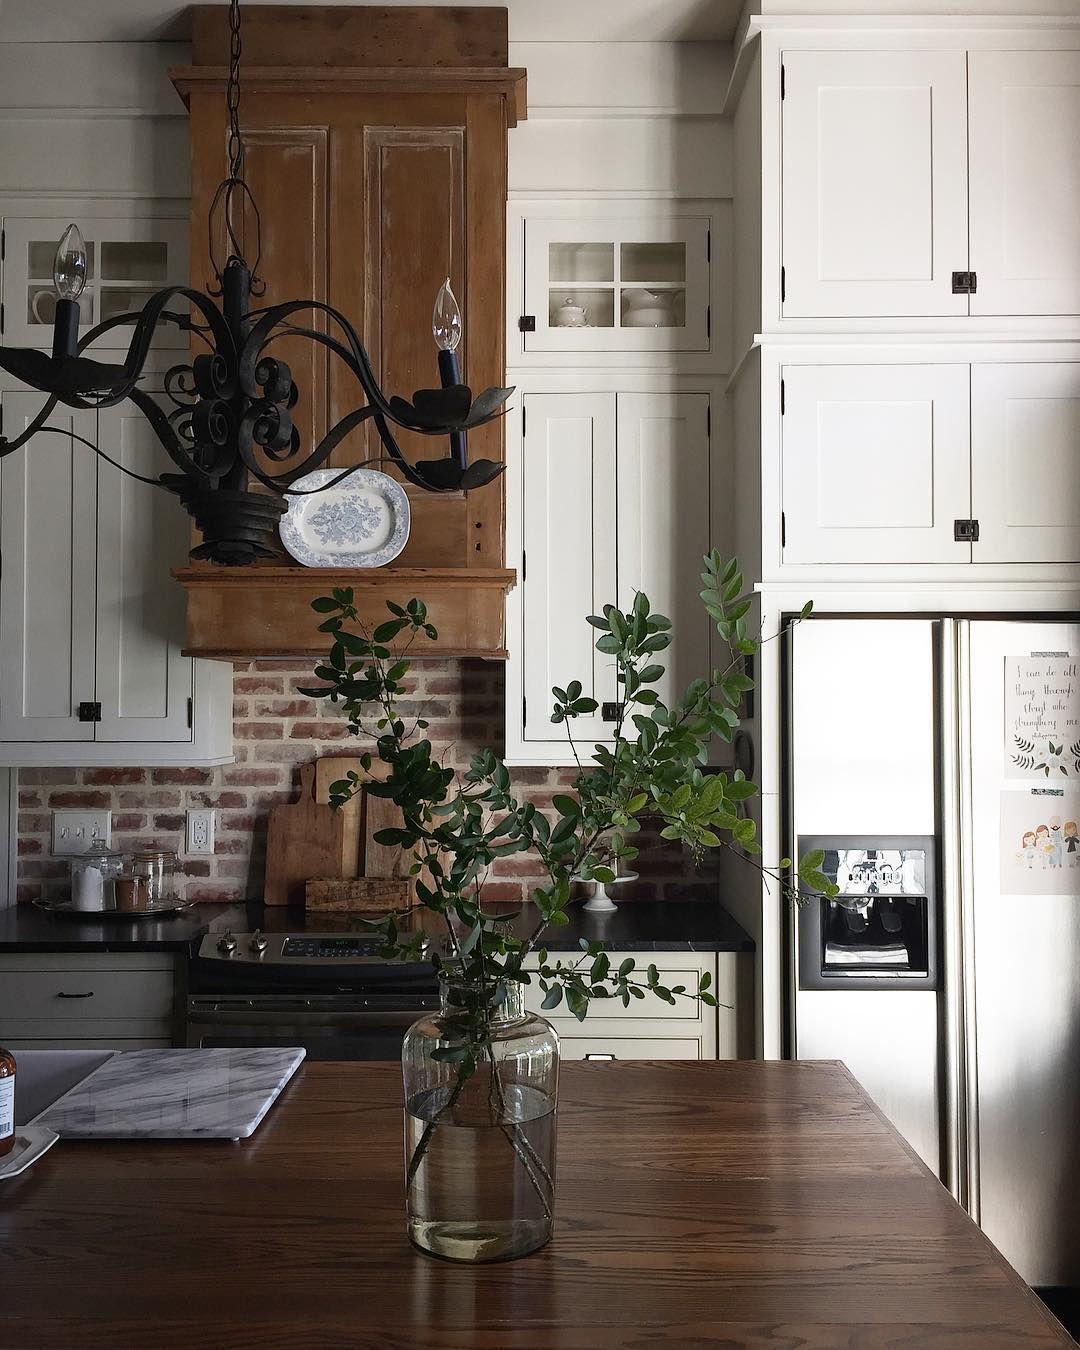 Pin de Brandi Leeder en Kitchen | Pinterest | Cocinas